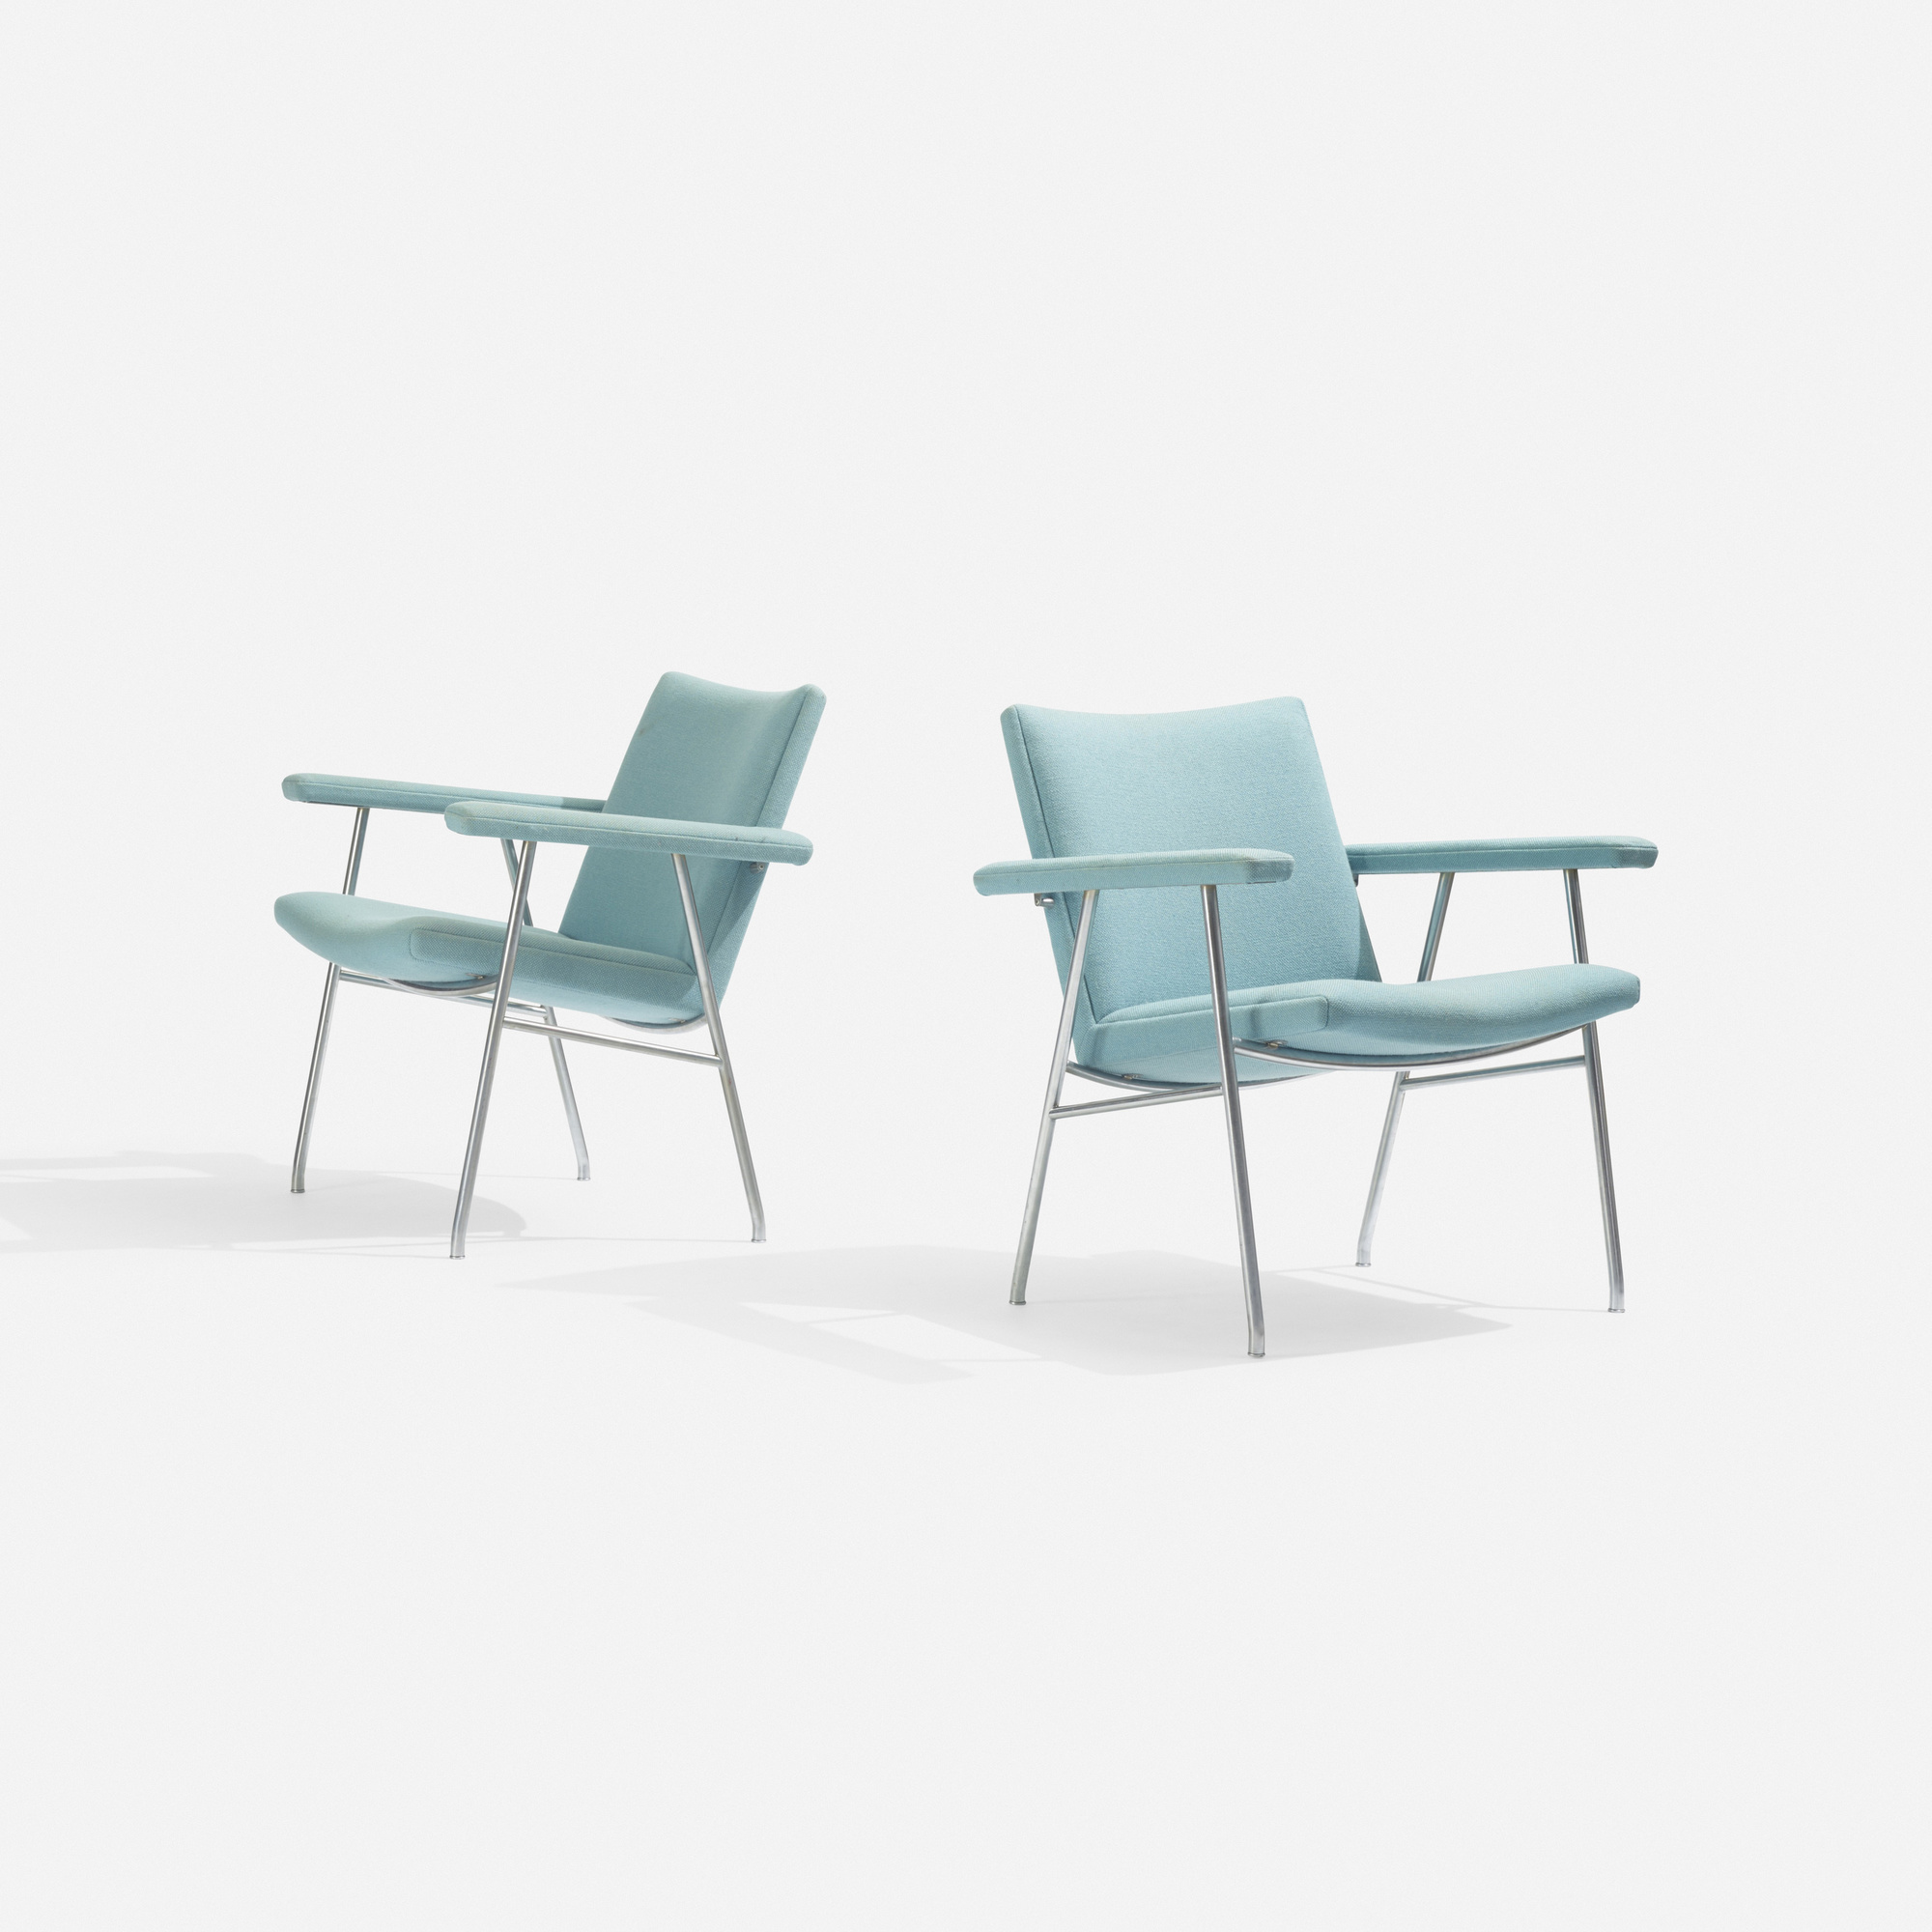 129: Hans J. Wegner / lounge chairs model AP 52, pair (2 of 3)